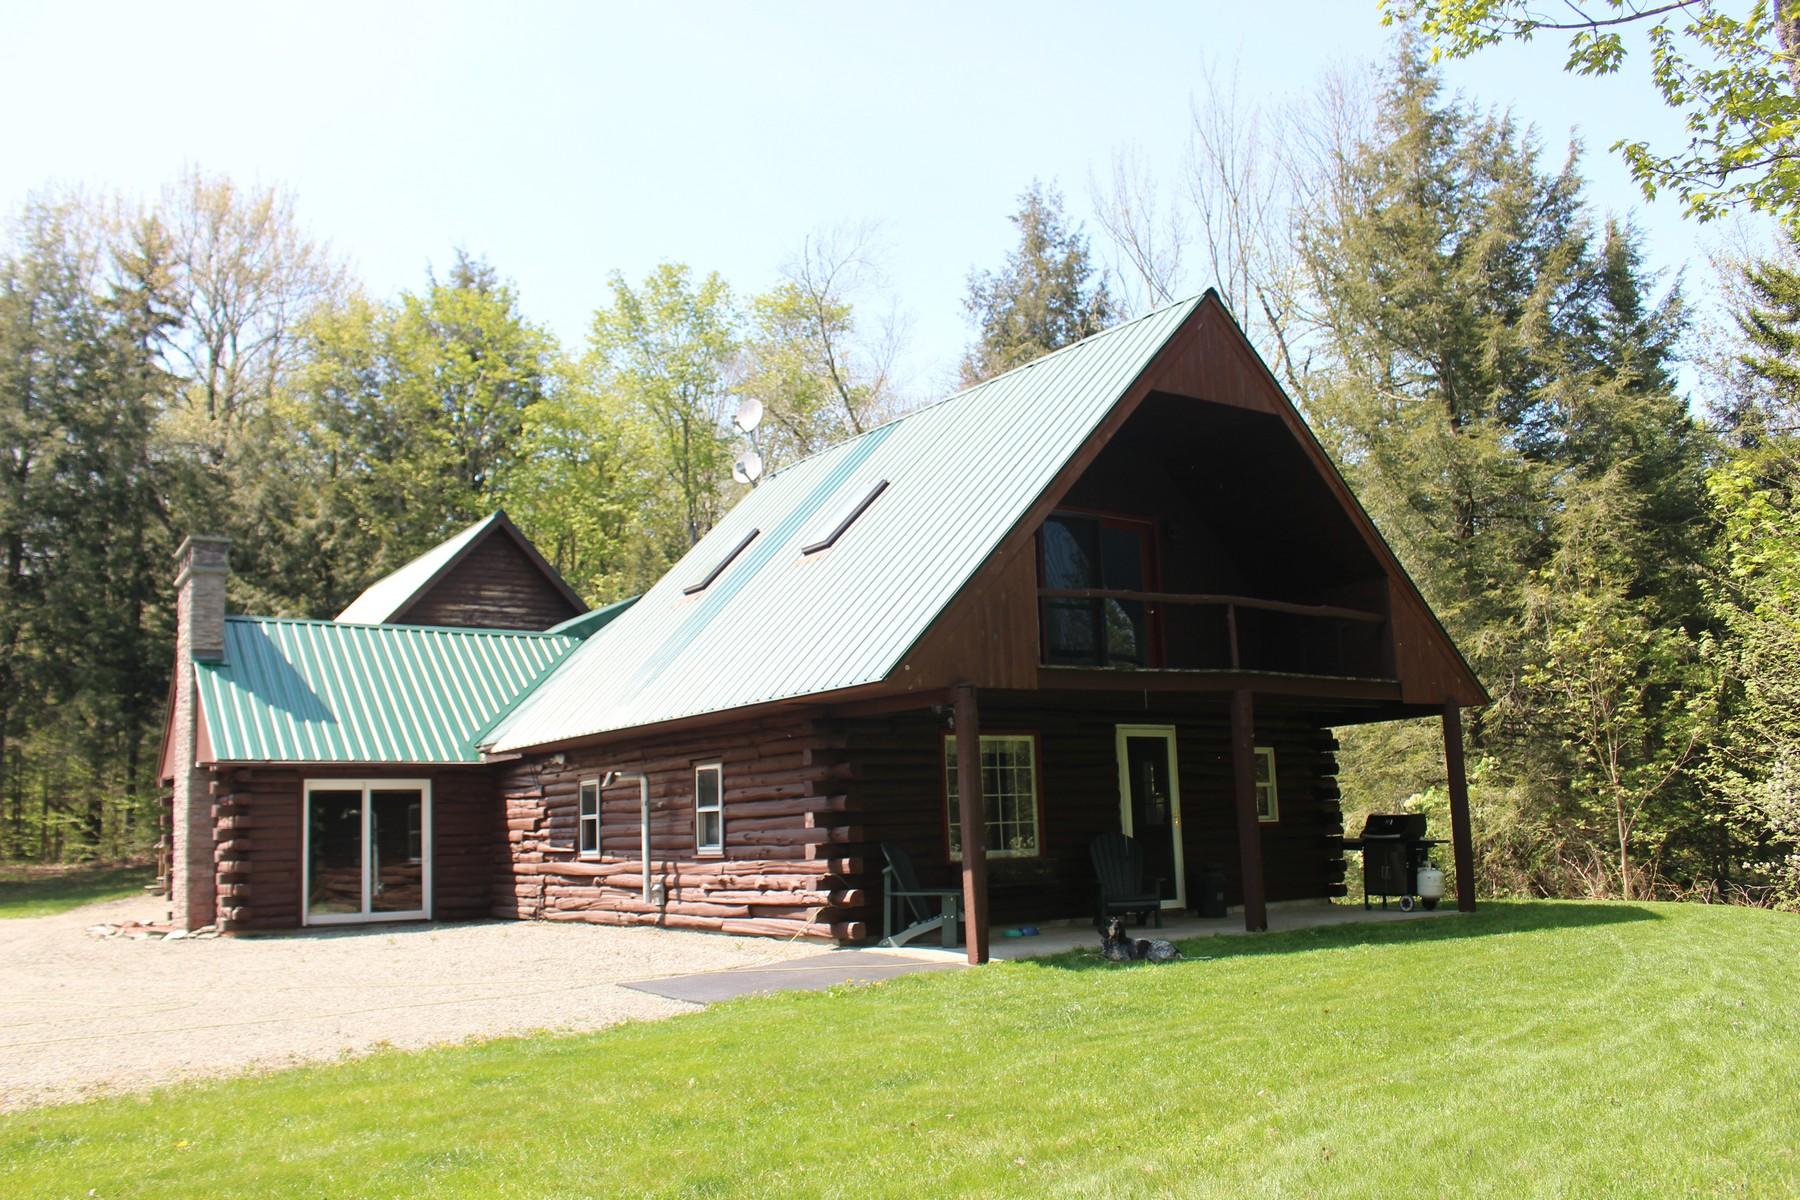 独户住宅 为 销售 在 414 South Pond Road, Eden 414 South Pond Rd Eden, 佛蒙特州, 05653 美国